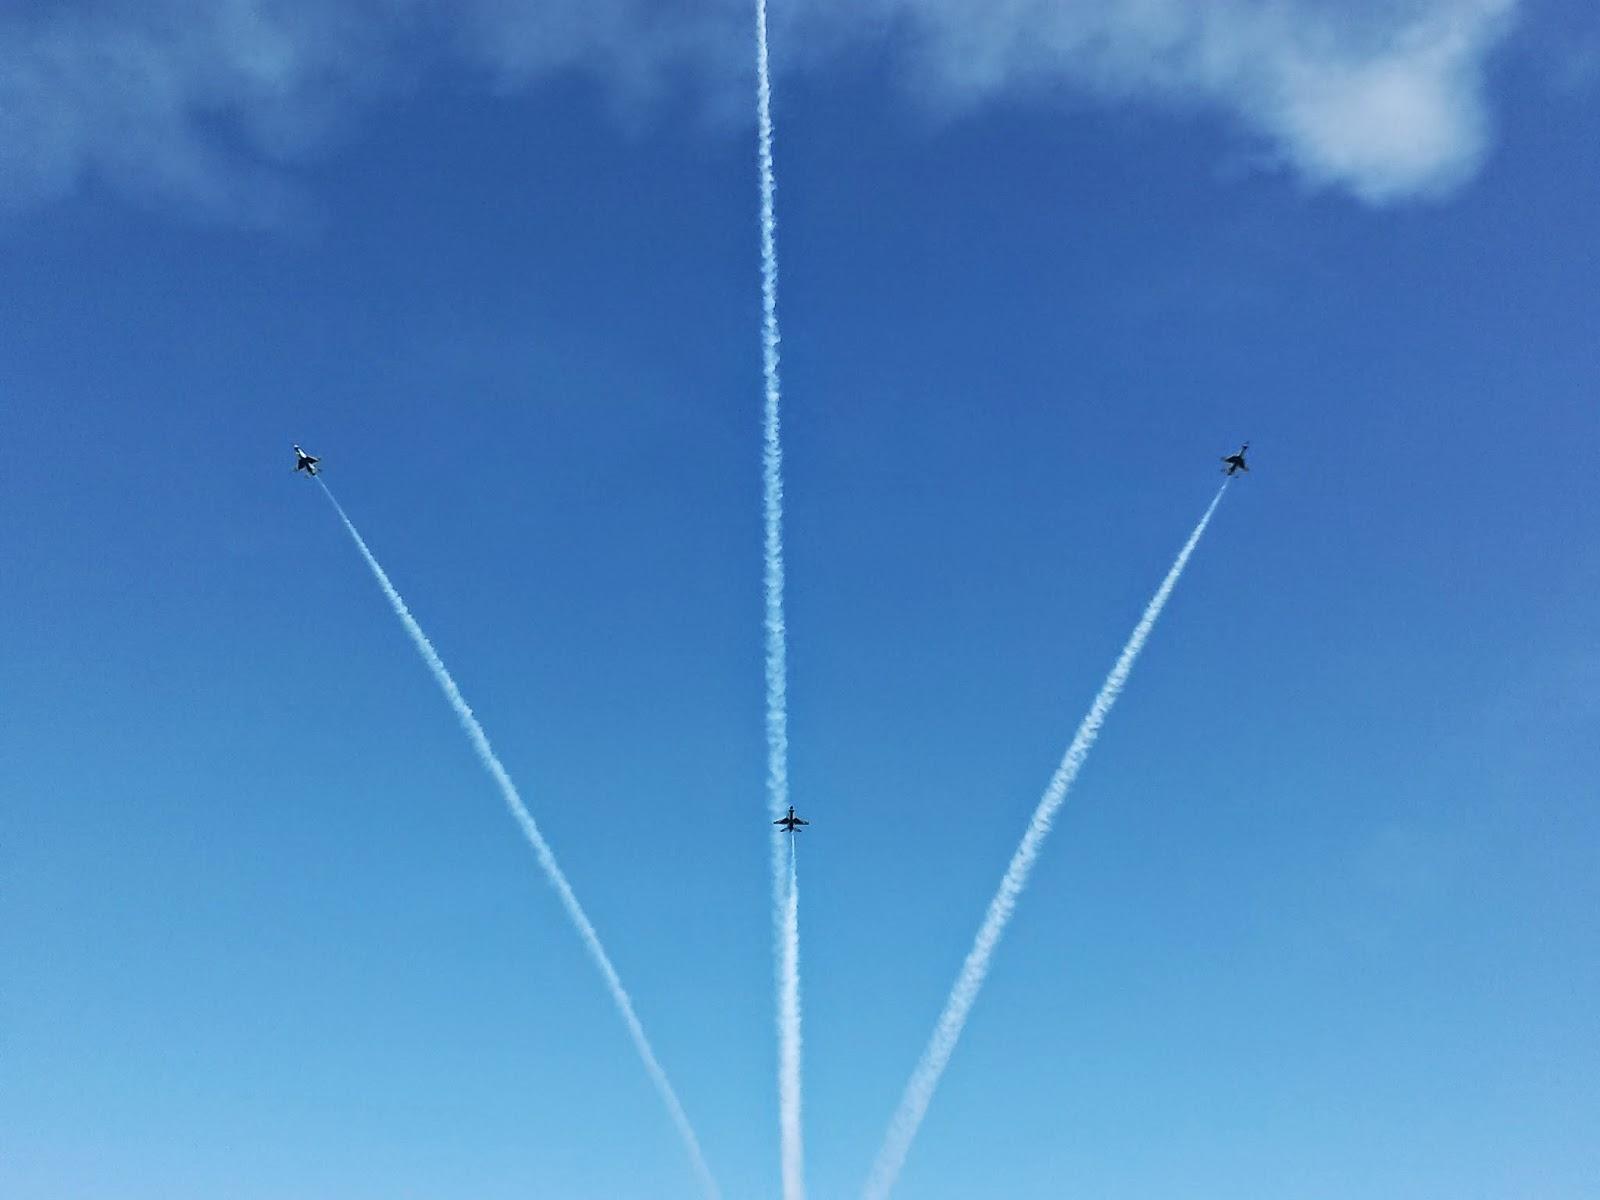 United States Air Force Thunderbirds Bomb Burst Maneuver